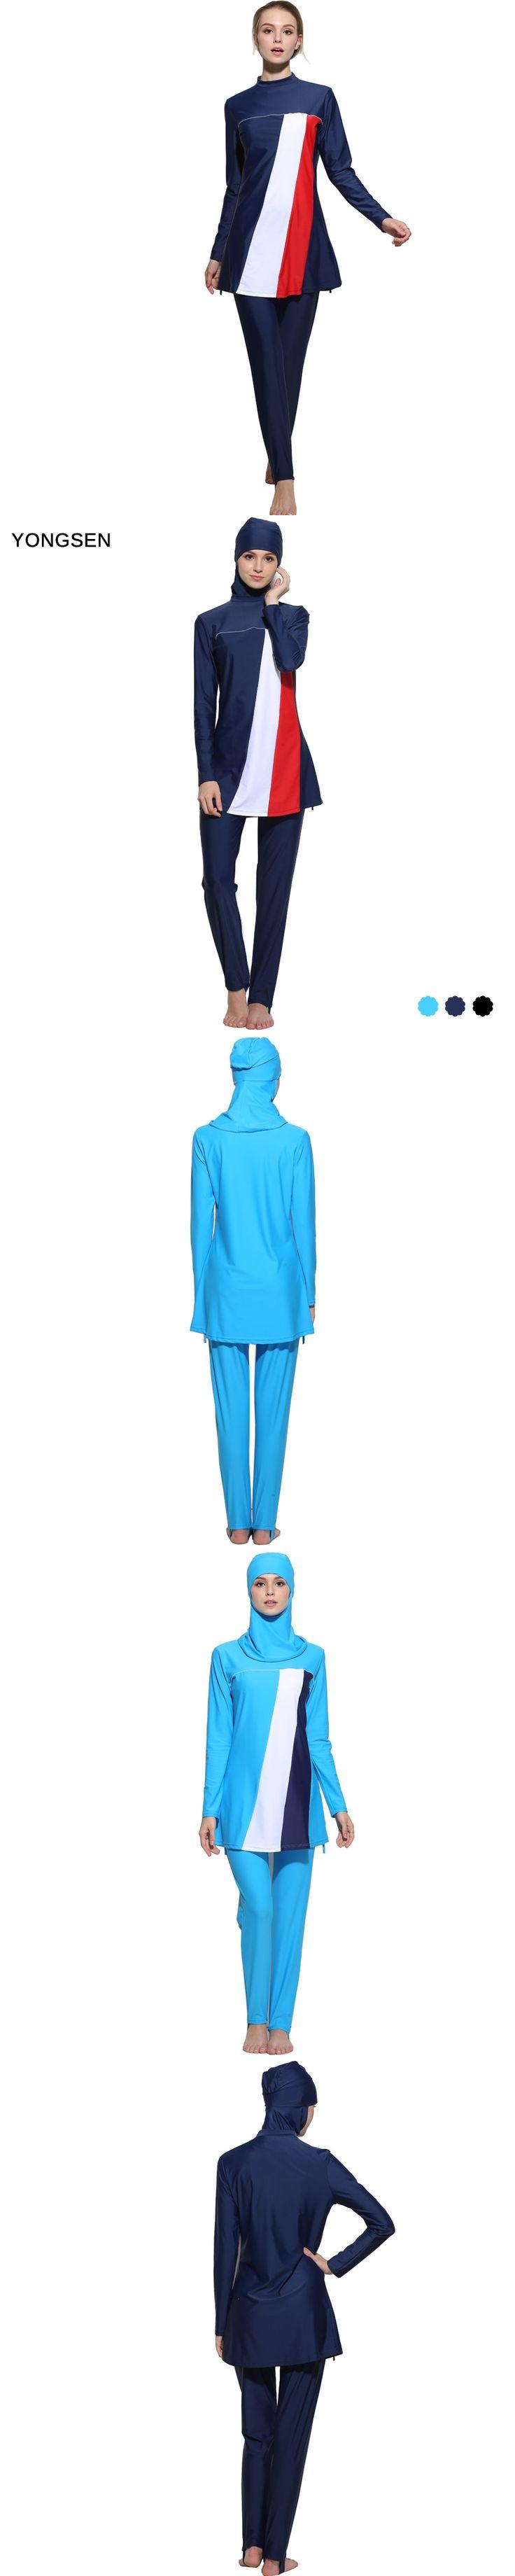 YONGSEN YONGSEN Plus Size Modest  Women Muslim Swimwear Islamic Conservative burkinis Bathing hijab swimming Swimsuit Beachwear